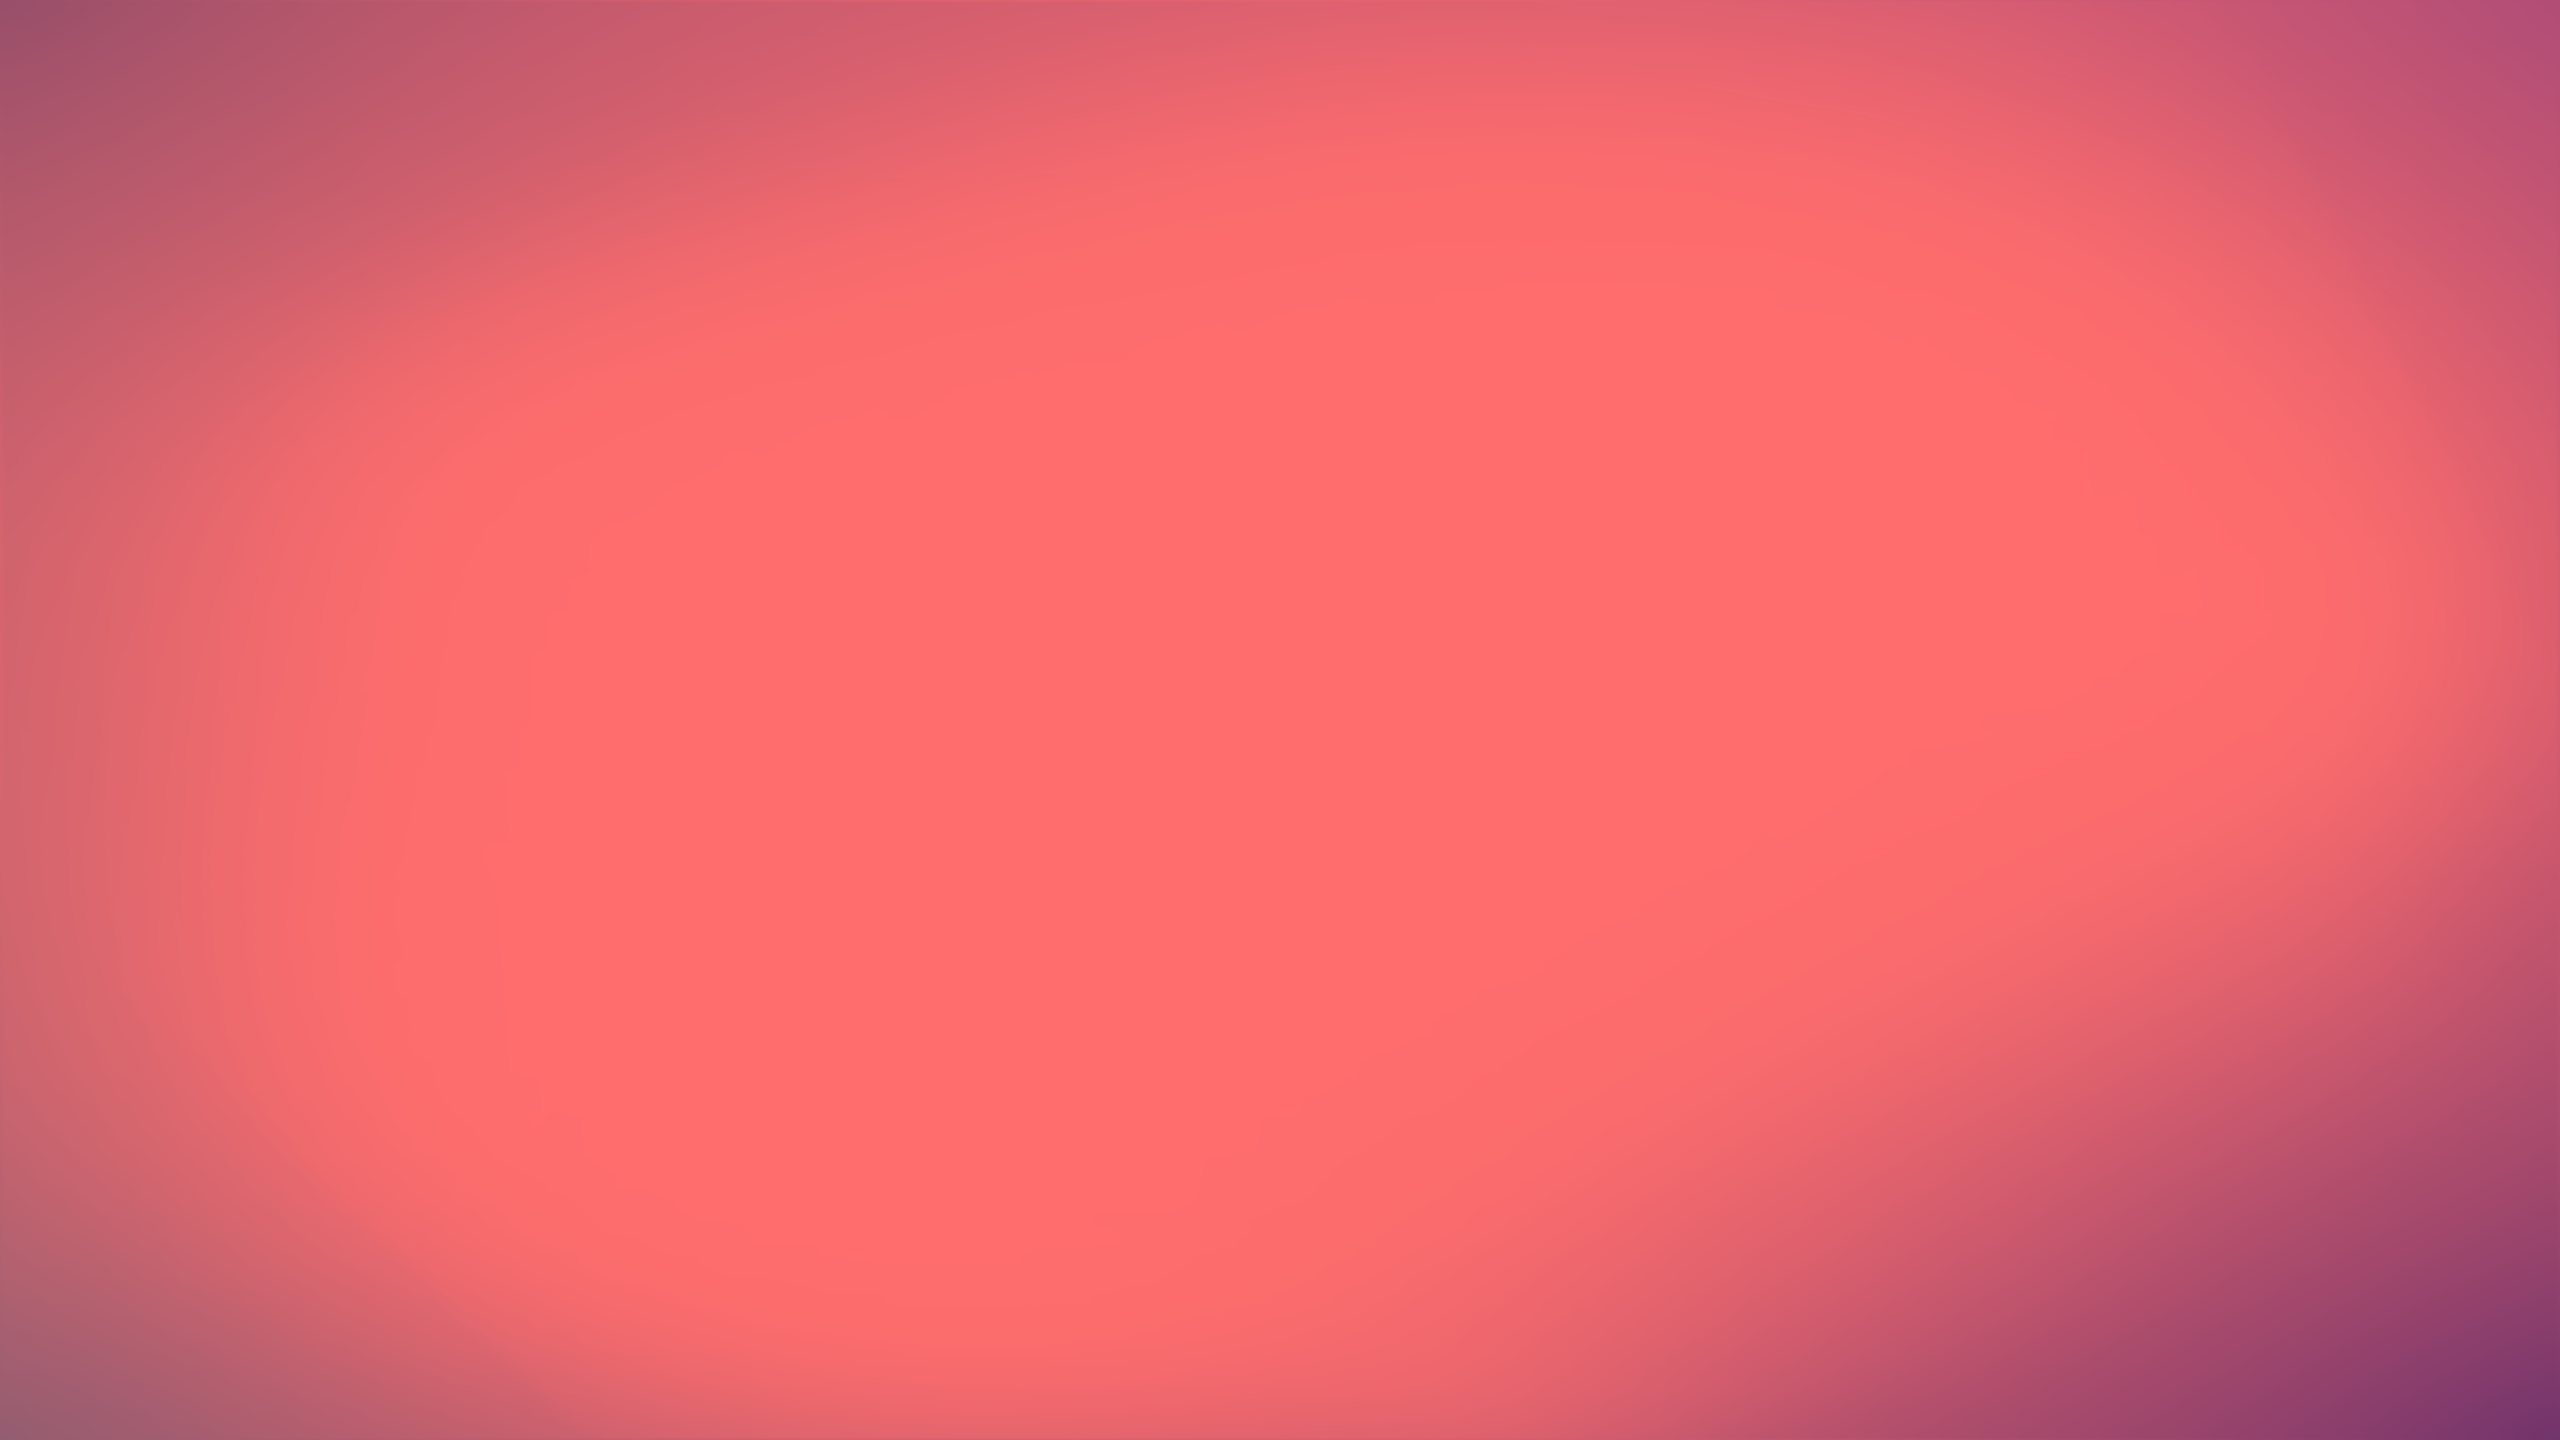 screen_2560x1440_2018-02-03_19-06-30.png